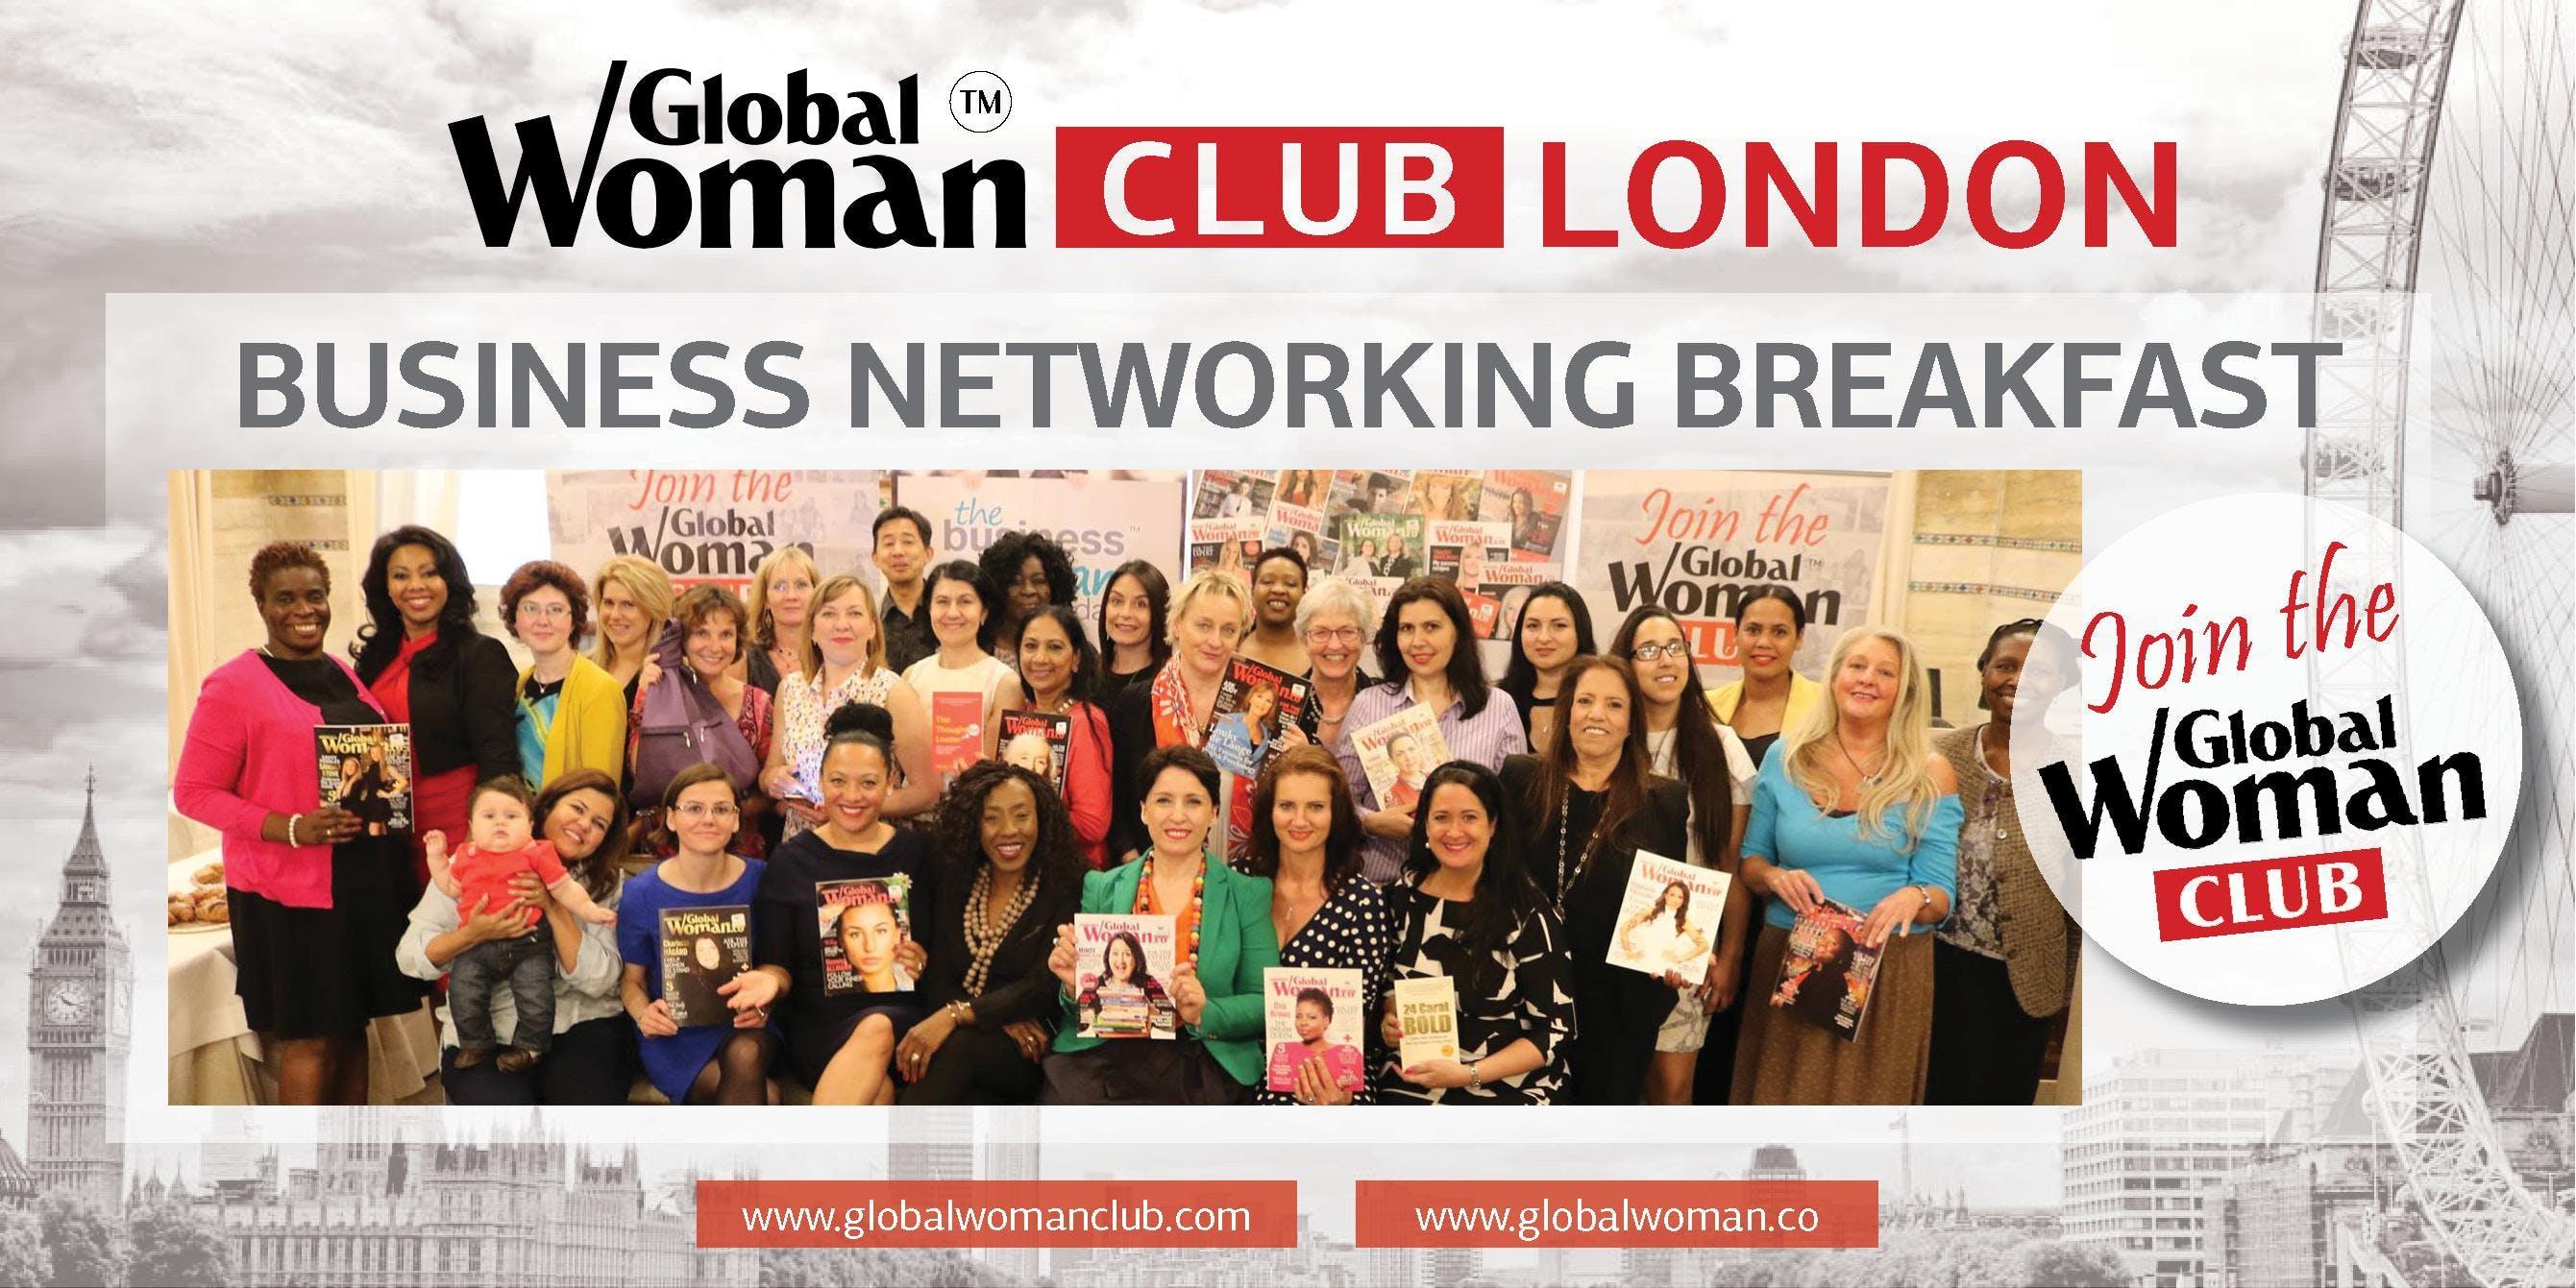 GLOBAL WOMAN CLUB LONDON: BUSINESS NETWORKING BREAKFAST - FEBRUARY